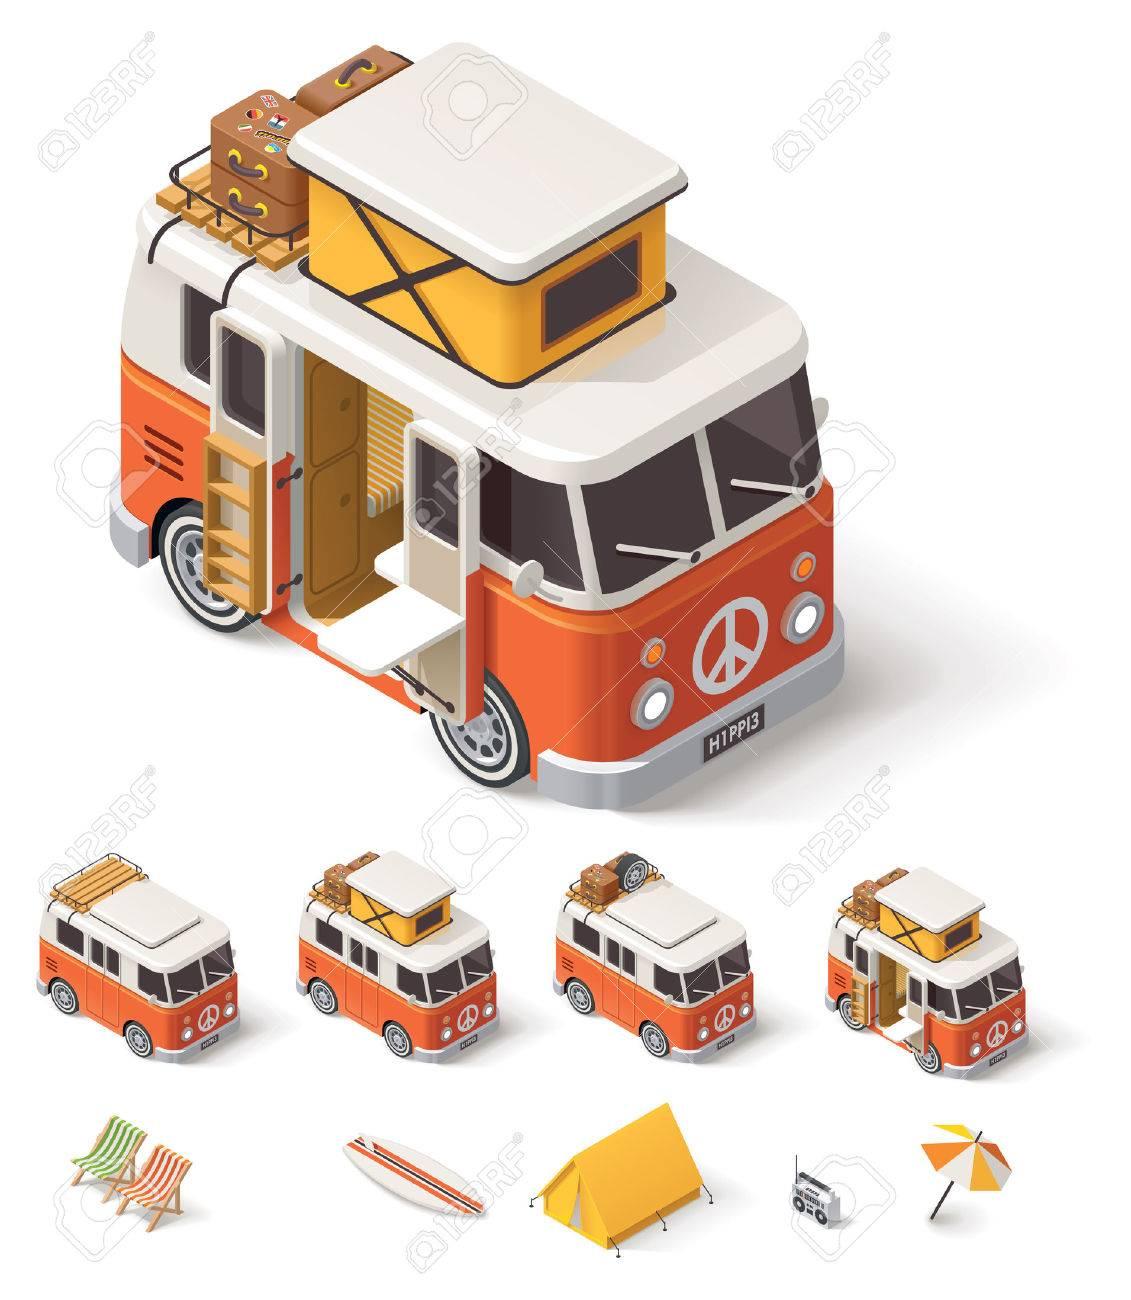 Isometric Retro Camper Van And Travelers Equipment Stock Vector